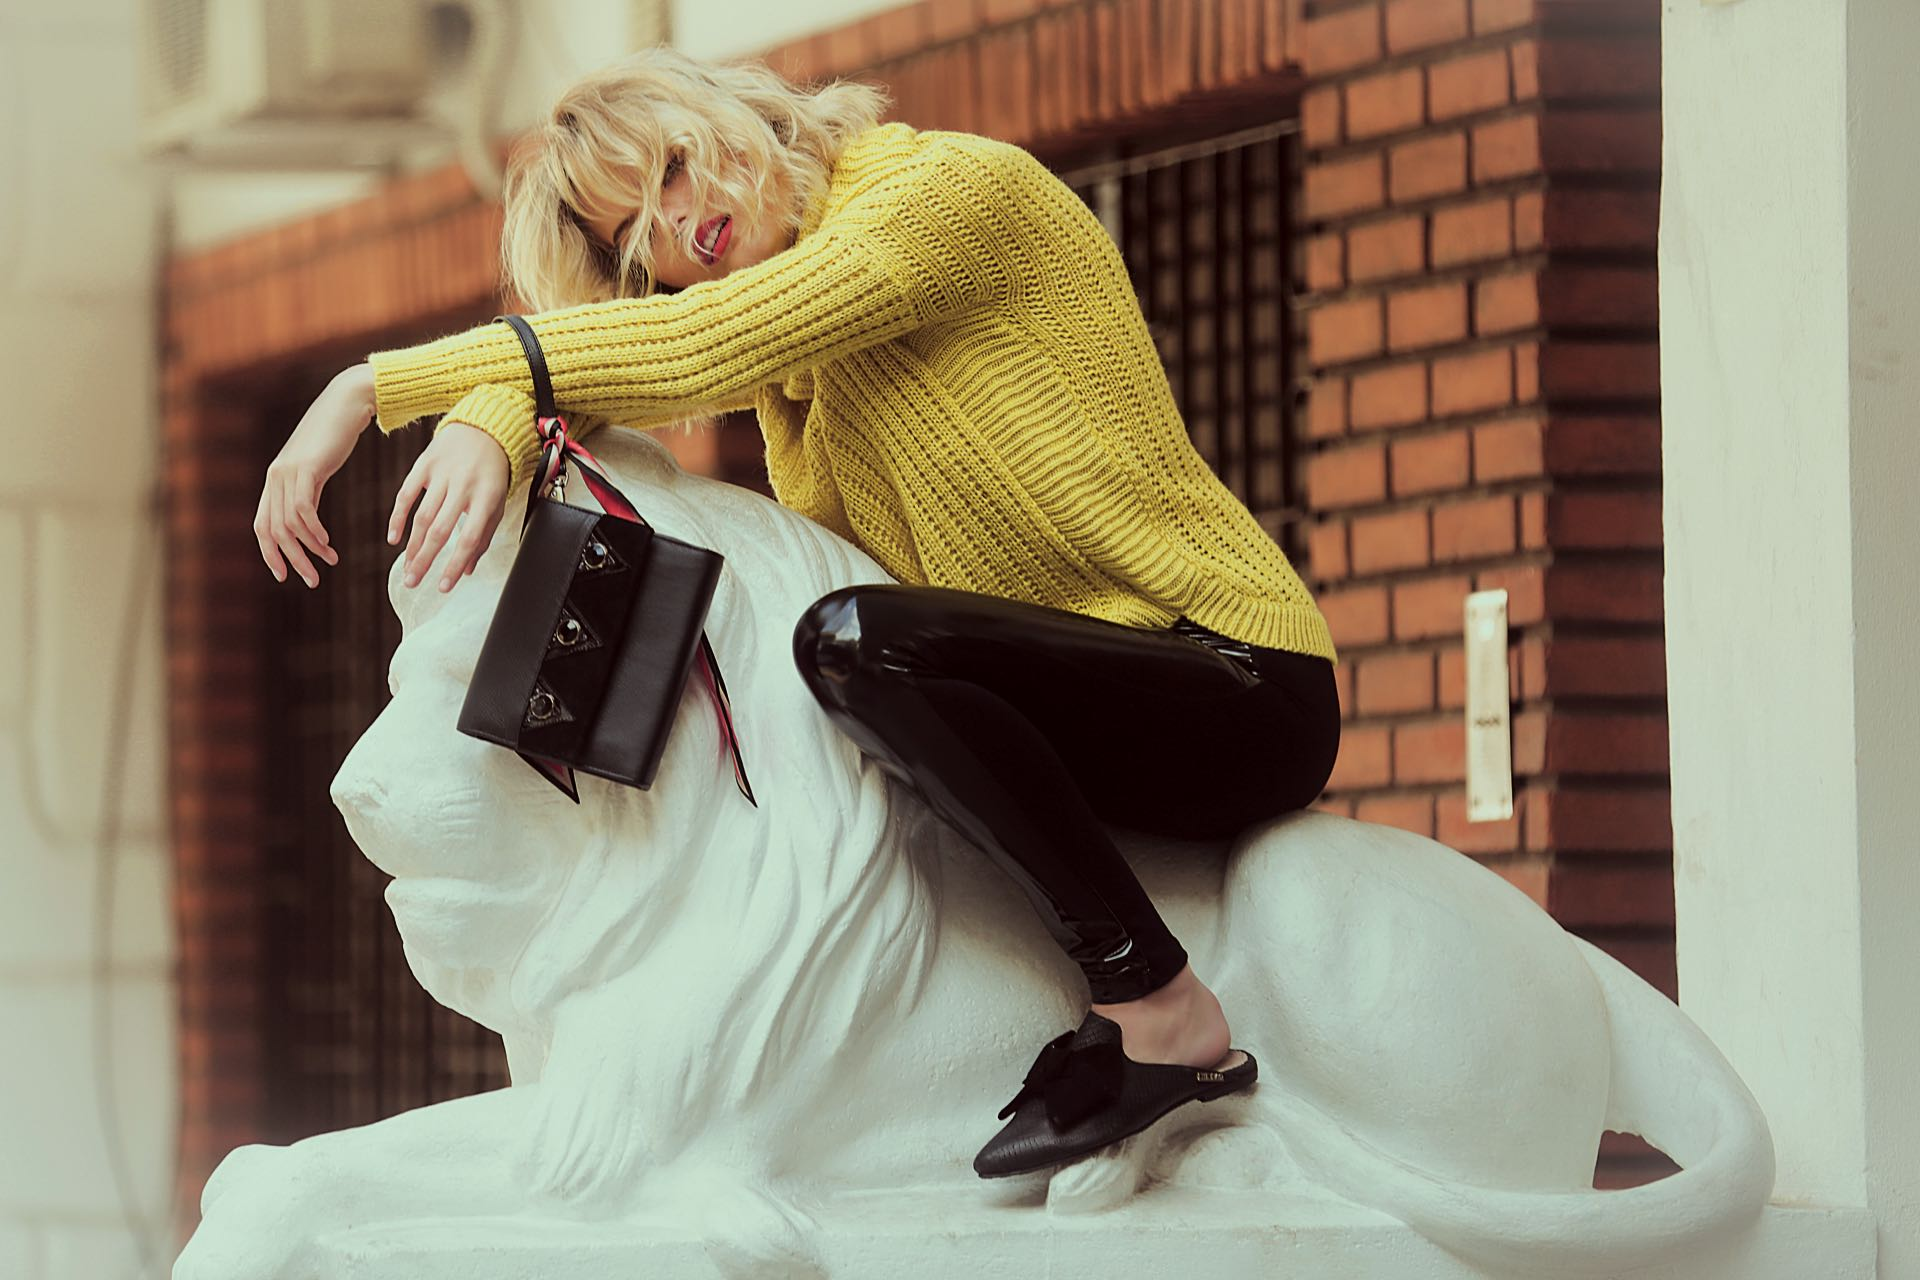 Polera de lana ($ 1.400, Agustina Domínguez), leggings de charol ($ 1.290, Basement para Falabella), sobre de cuero con apliques ($ 2.200, Olivetta), pañuelo estampado ($ 450, Vitamina) y mules de cuero con moño de gamuza ($ 4.335, The Bag Belt).(Foto: Osky Sorairez/ Para Ti)